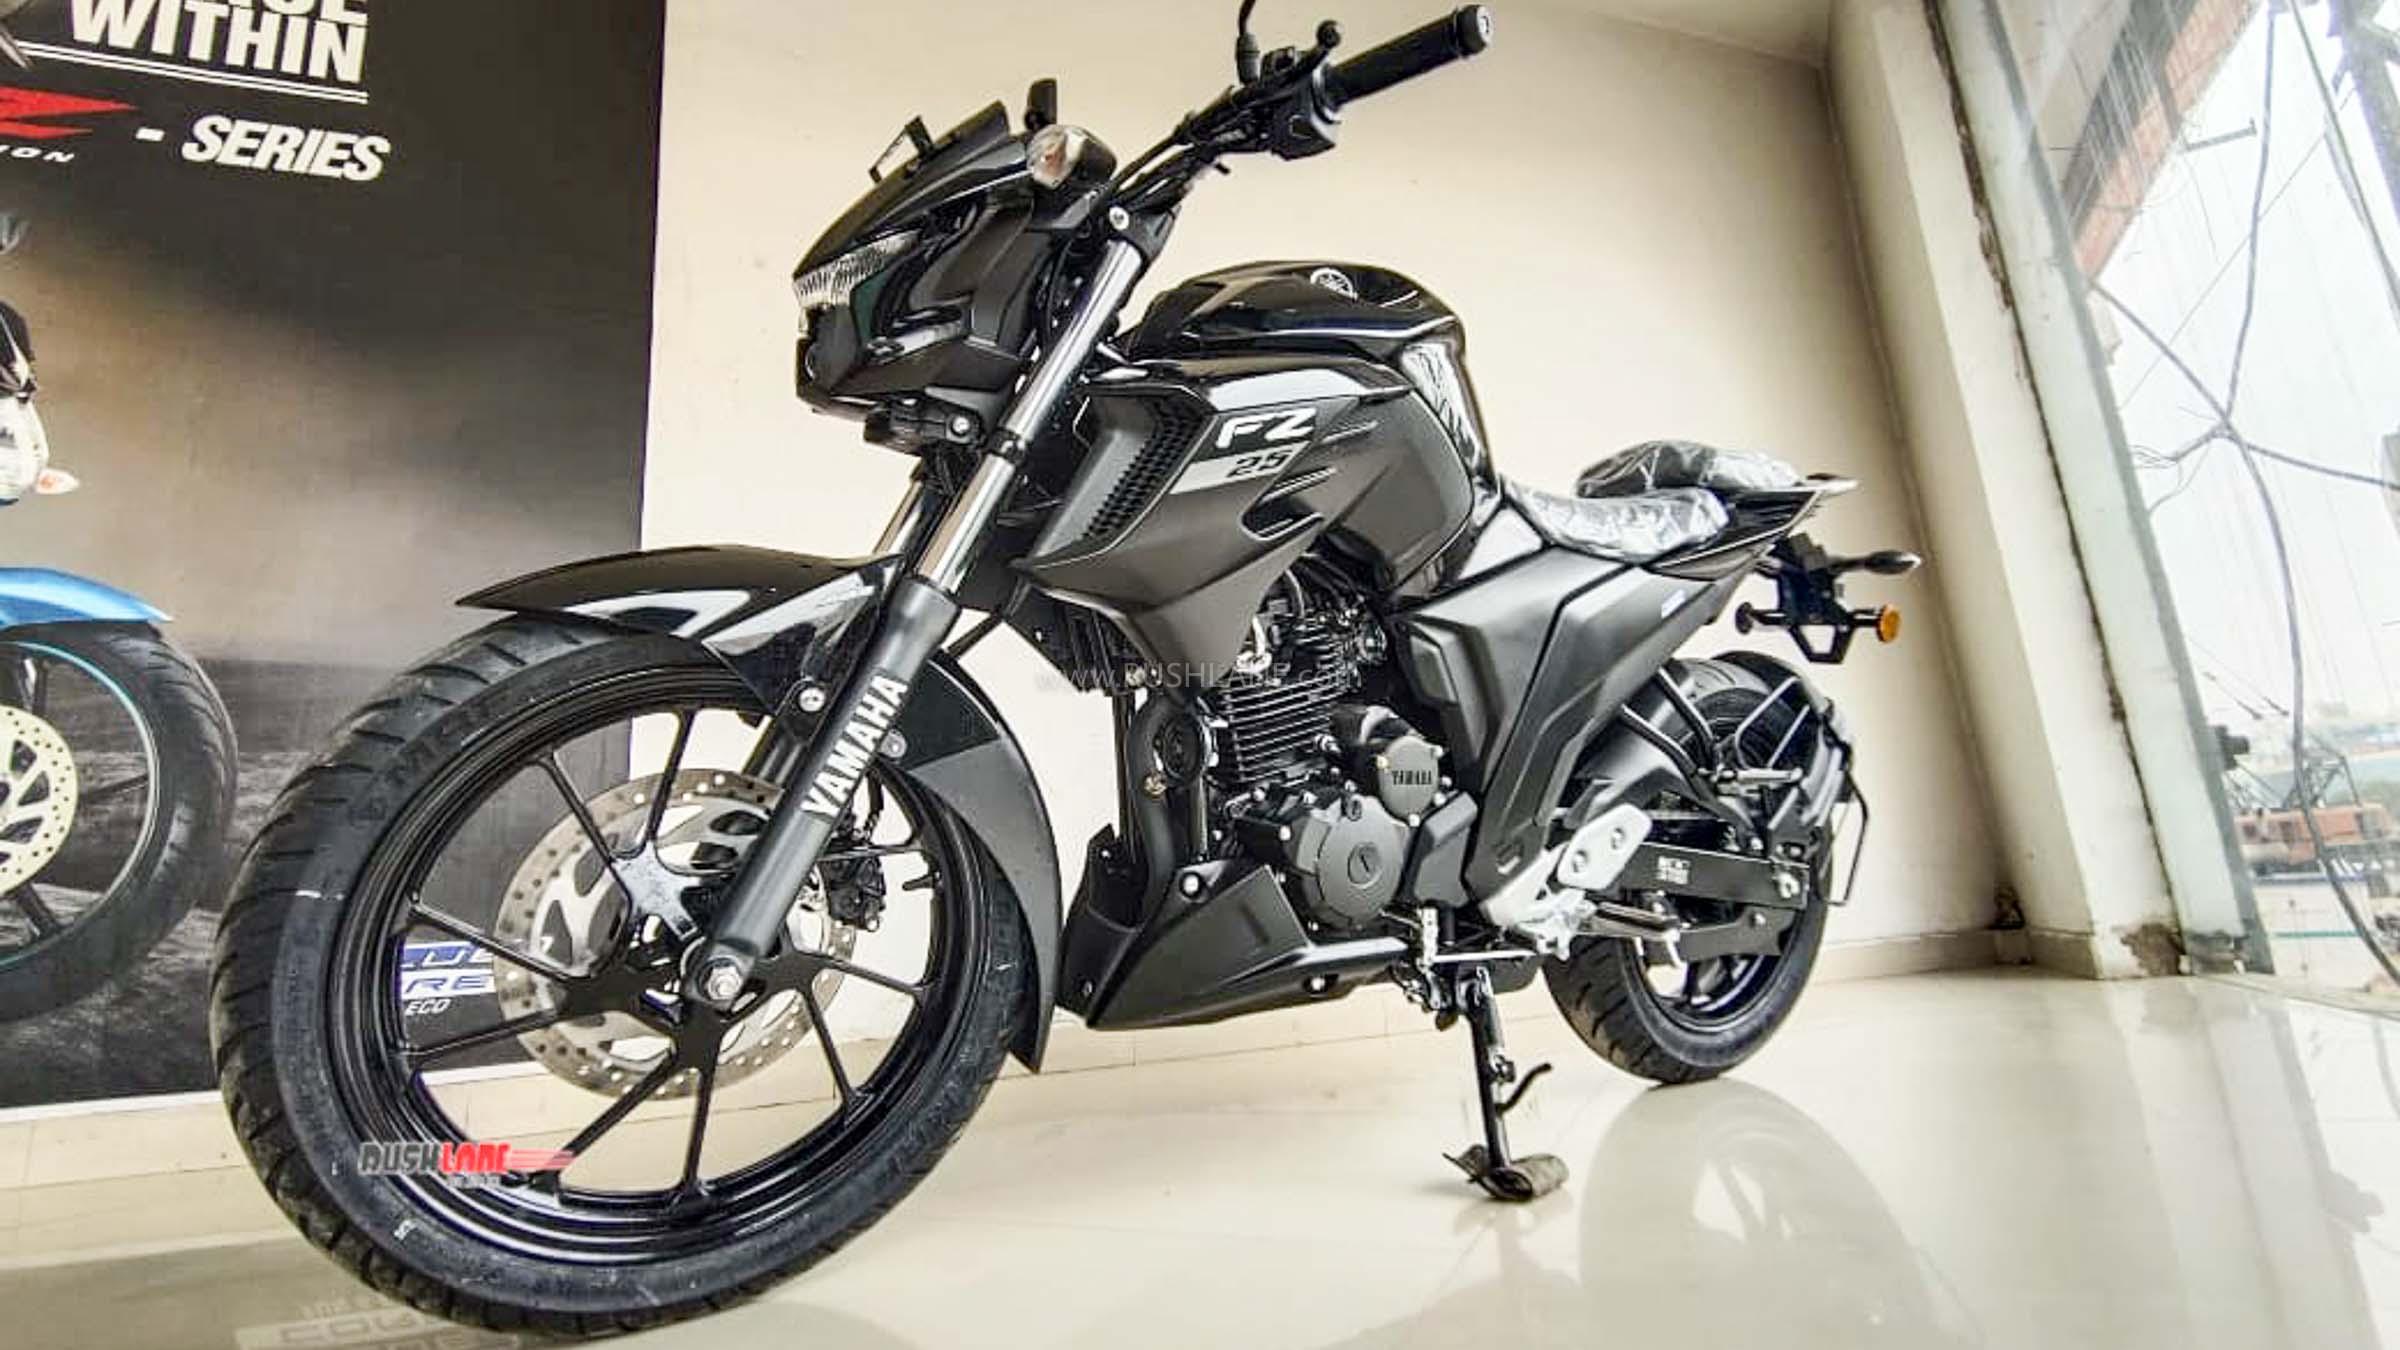 Yamaha FZ 25 BS6 Video Review